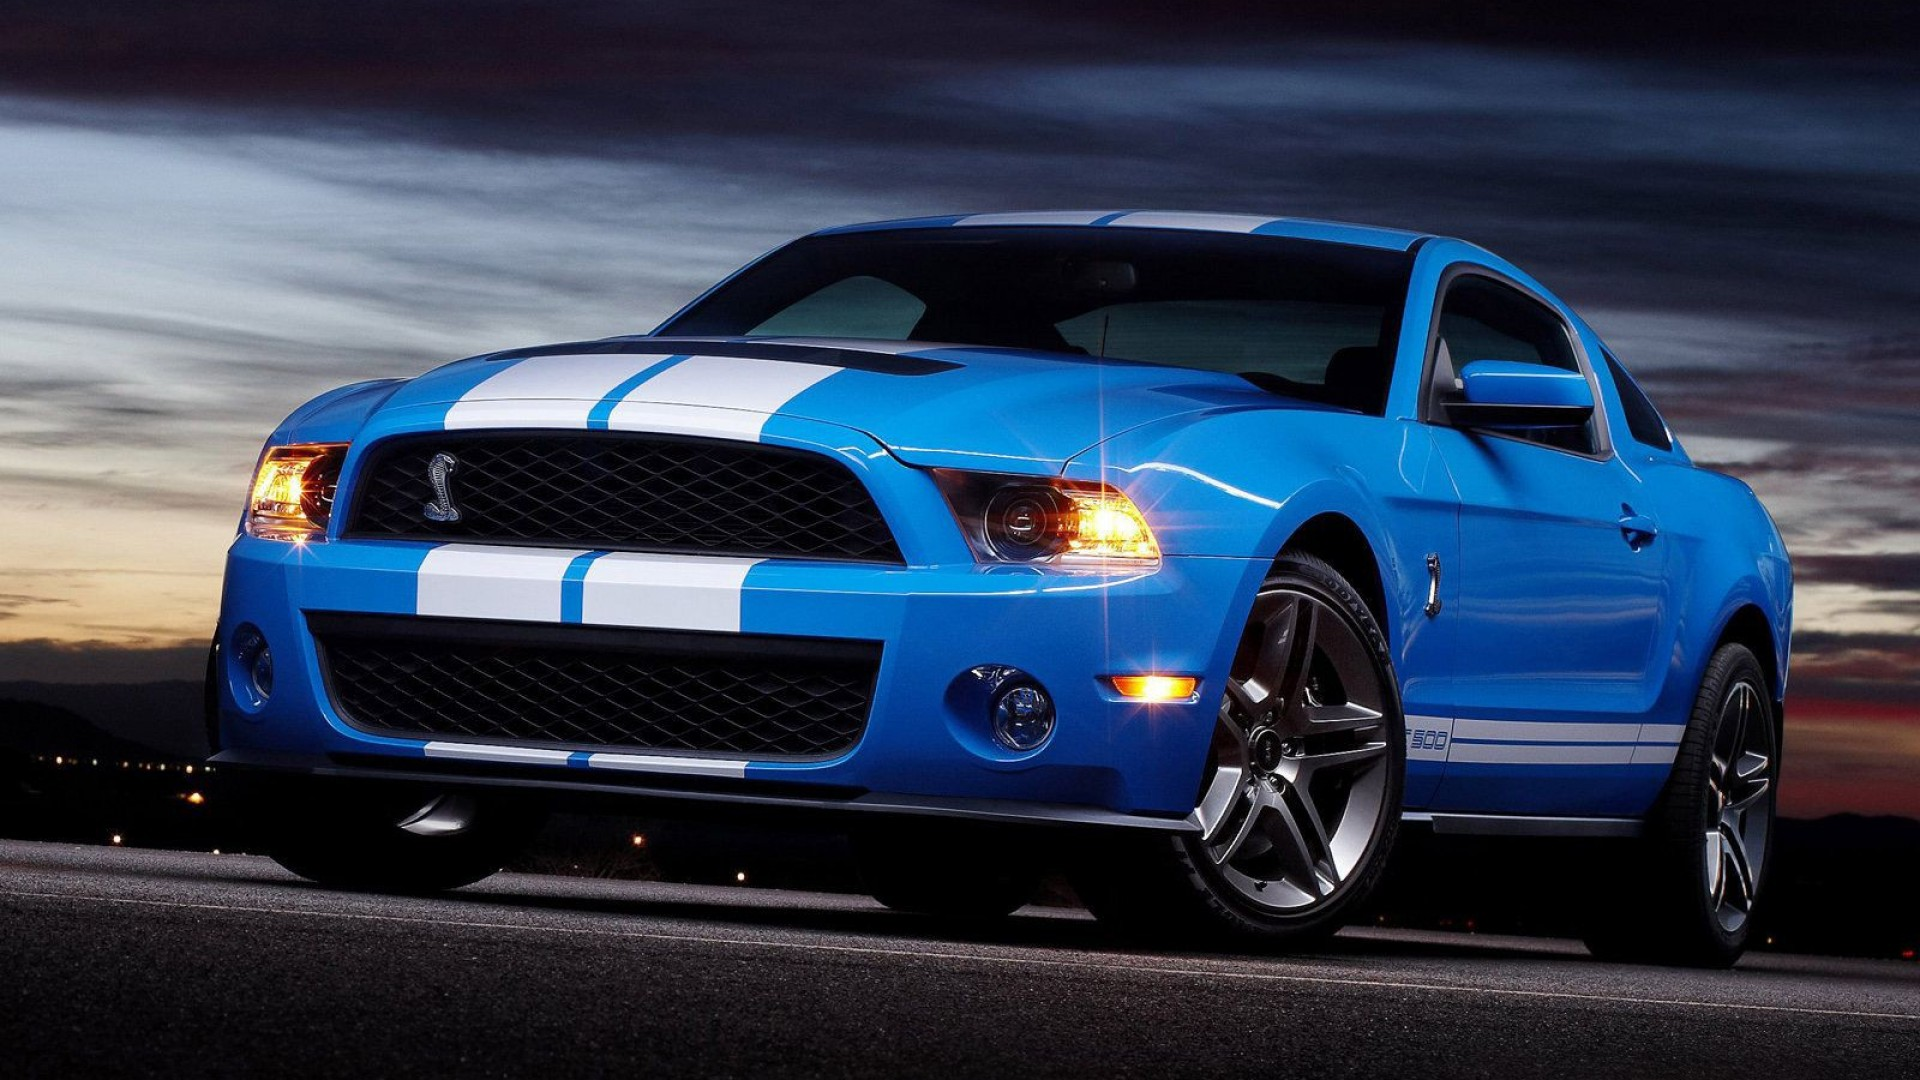 Mustang Wallpaper Cool Cars Picture Idokeren